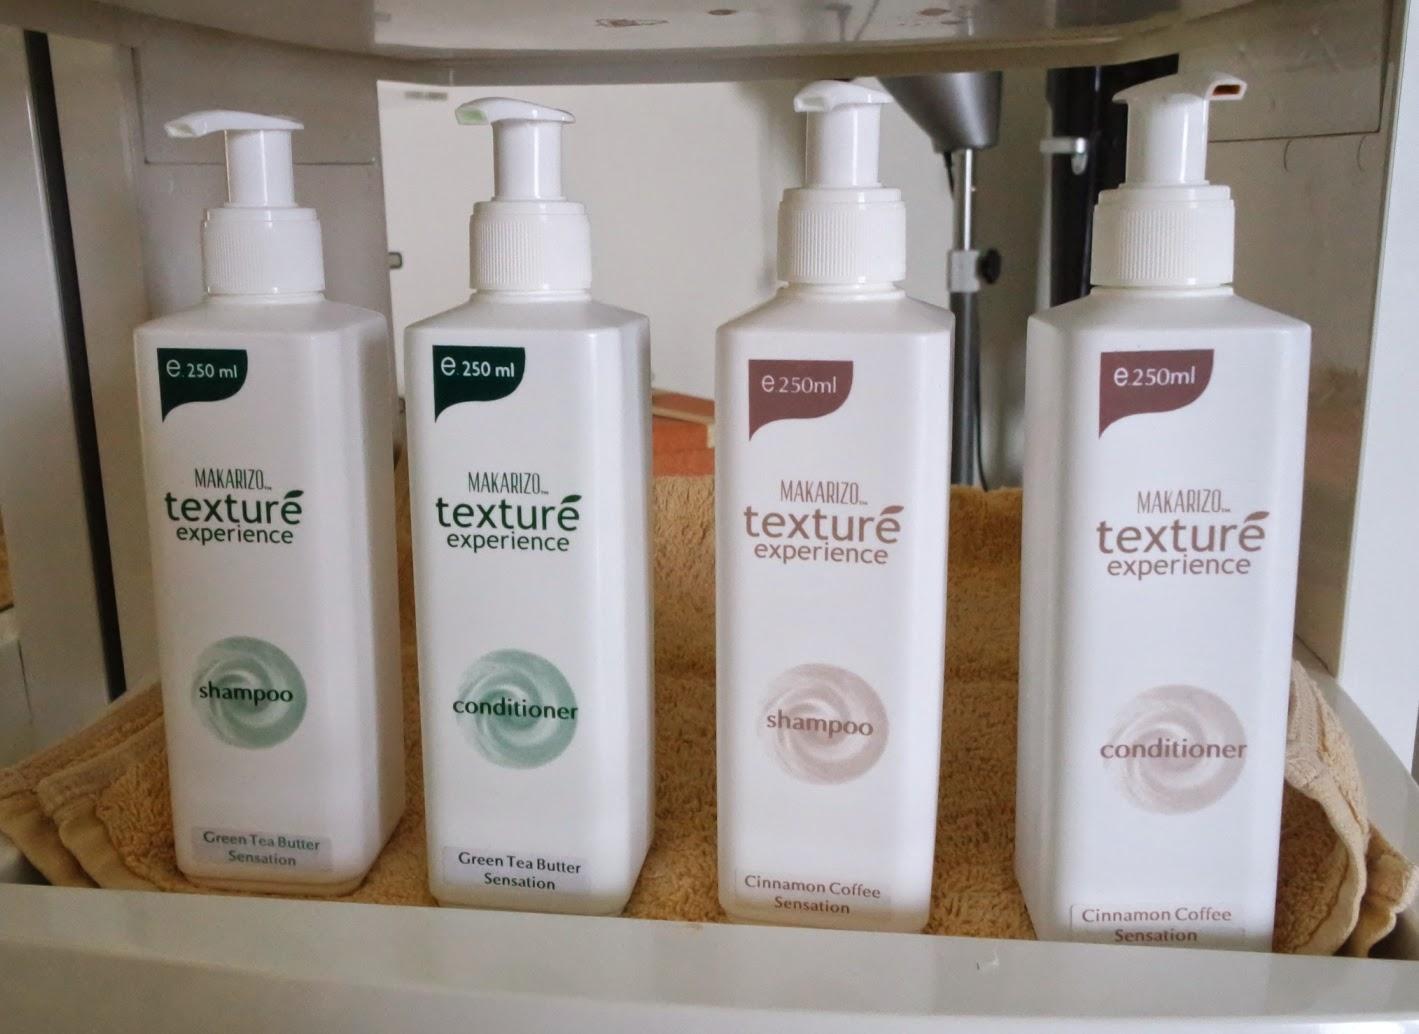 Tempat Jual Makarizo Professional Texture Experience Shampoo Conditioner 250ml Harga Green Tea Strawberry 250 Ml Butter When You Choose